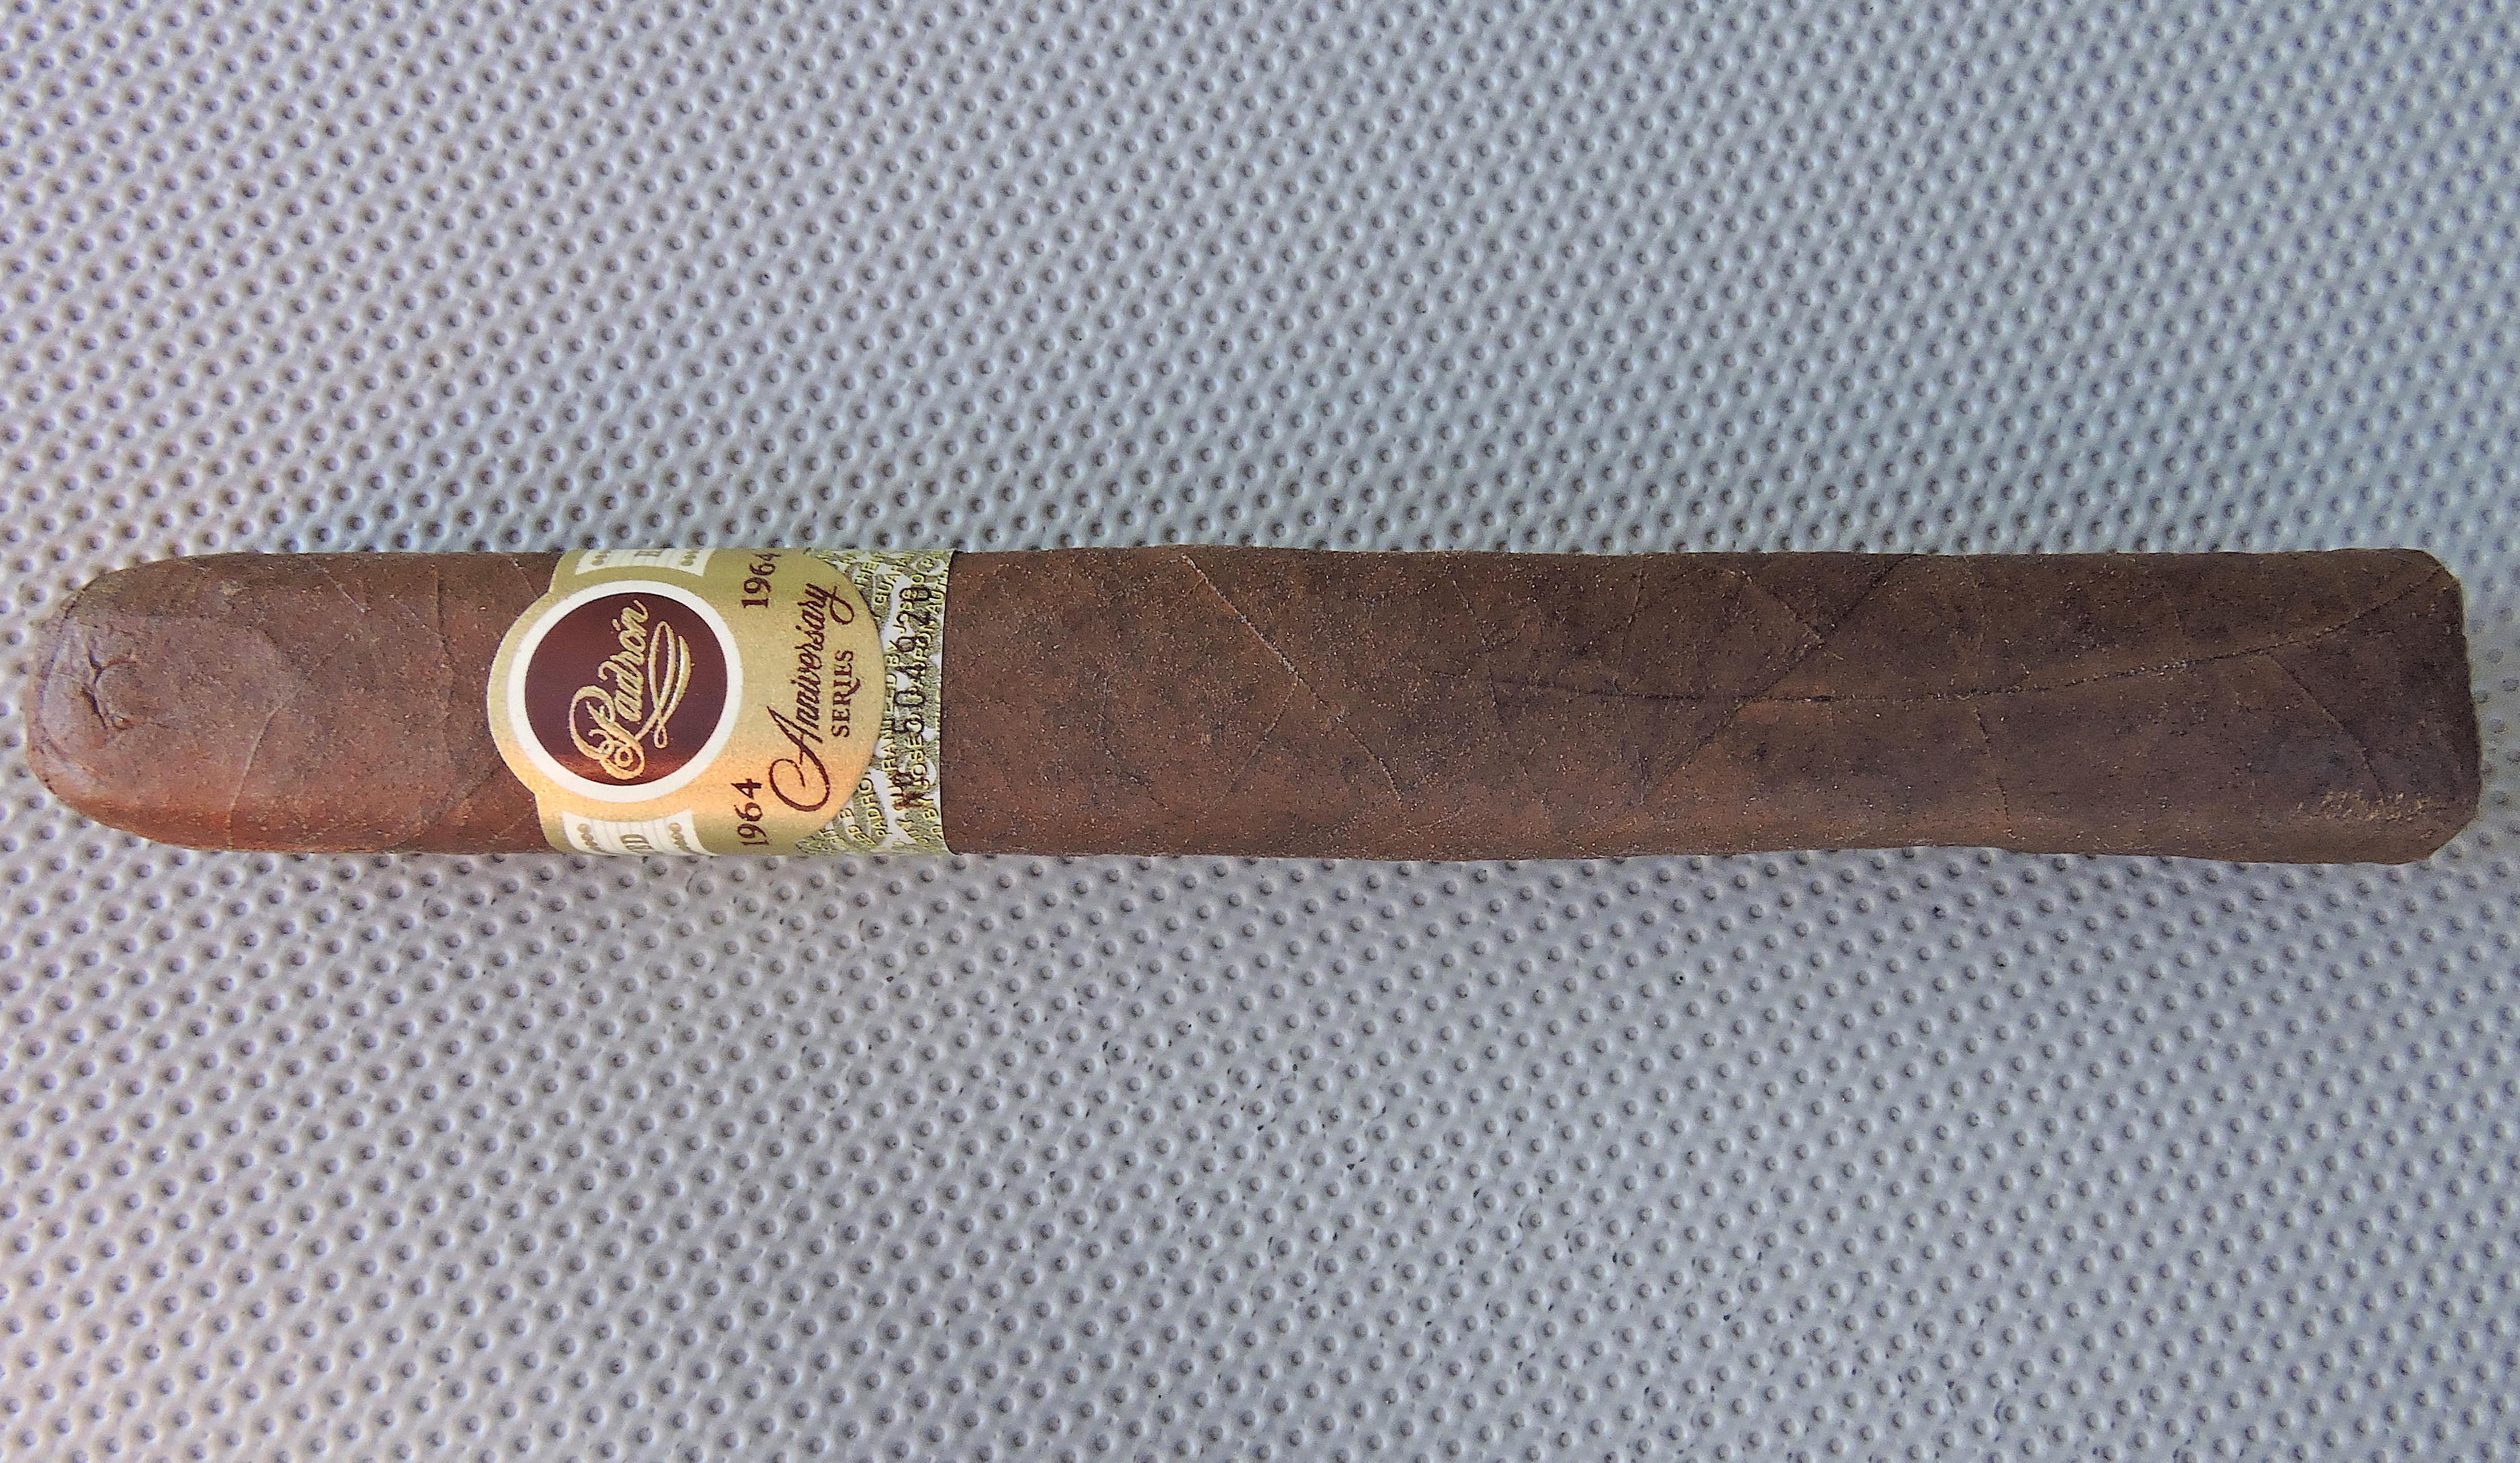 Agile Cigar Review: Padrón 1964 Anniversary Maduro Presidente